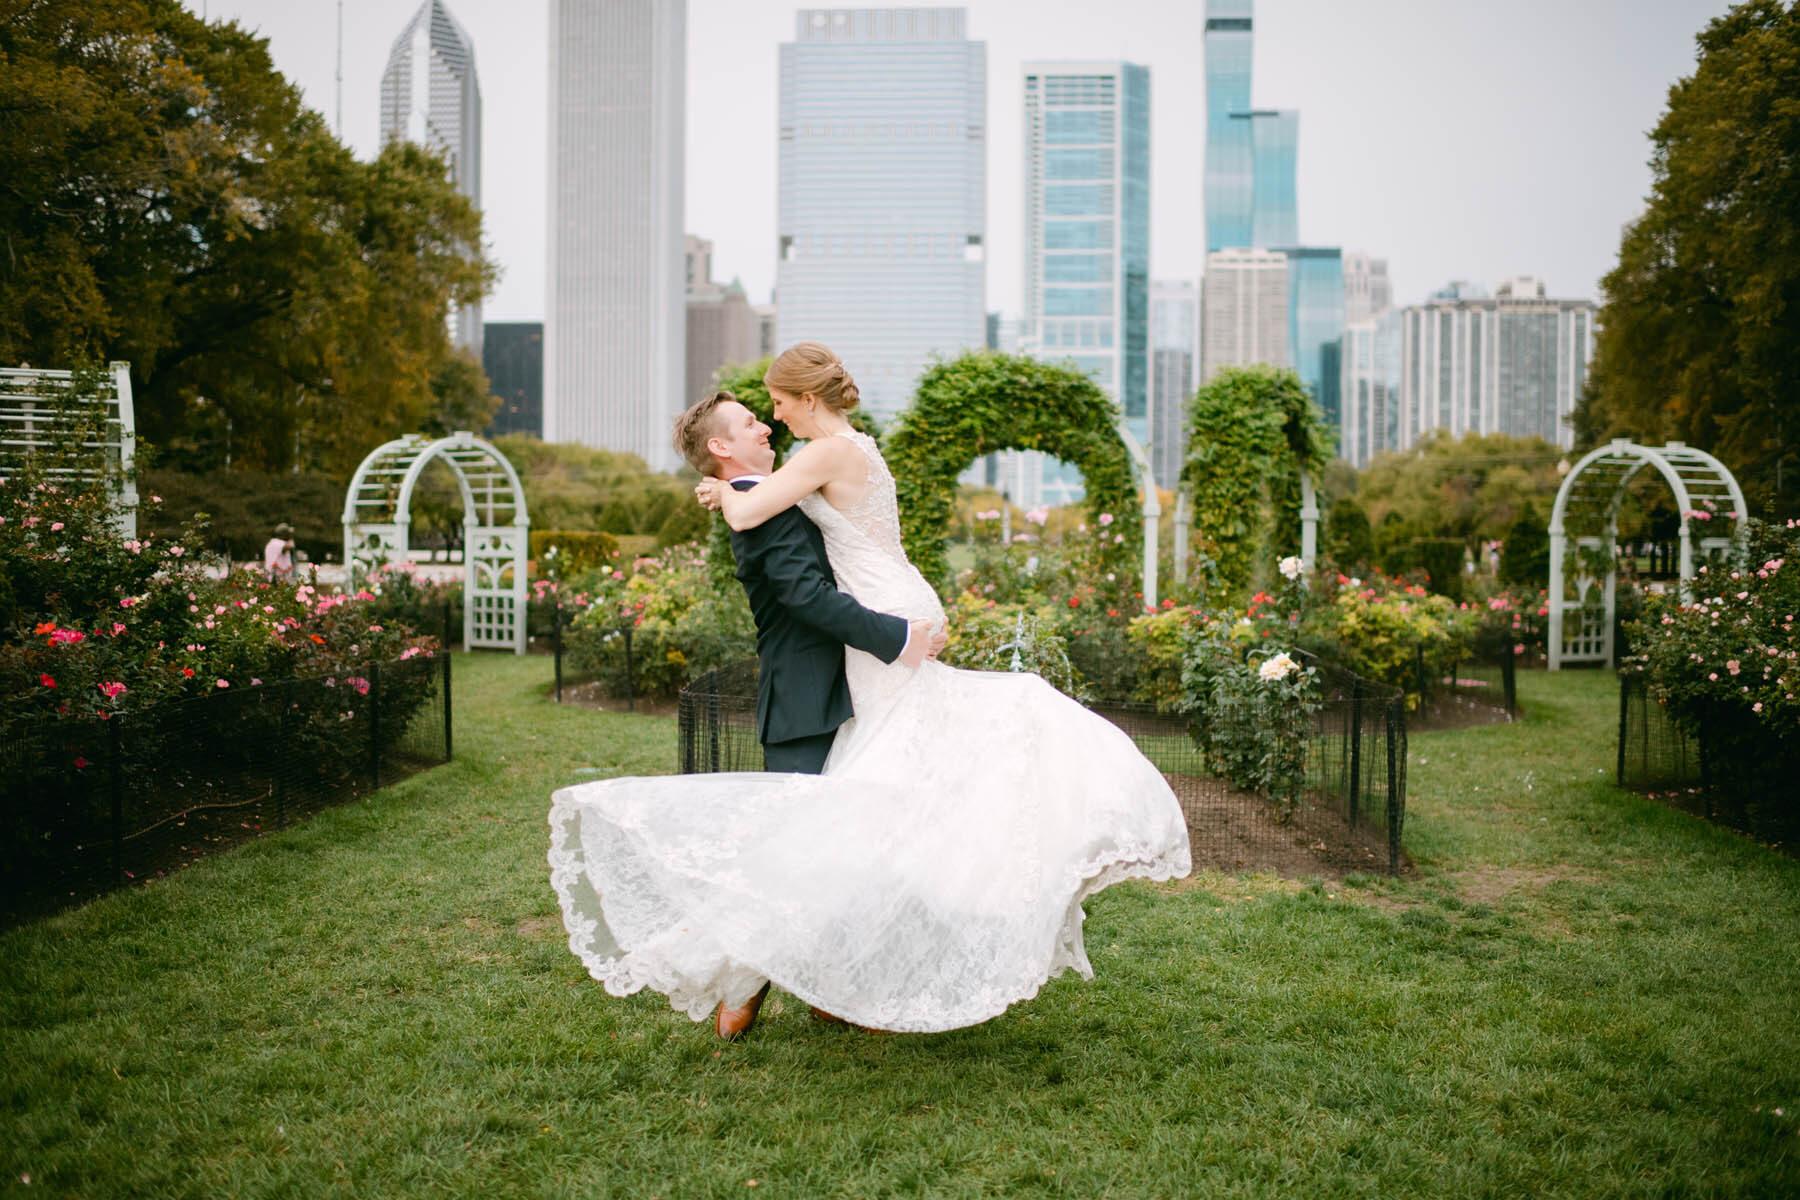 grant park wedding photo